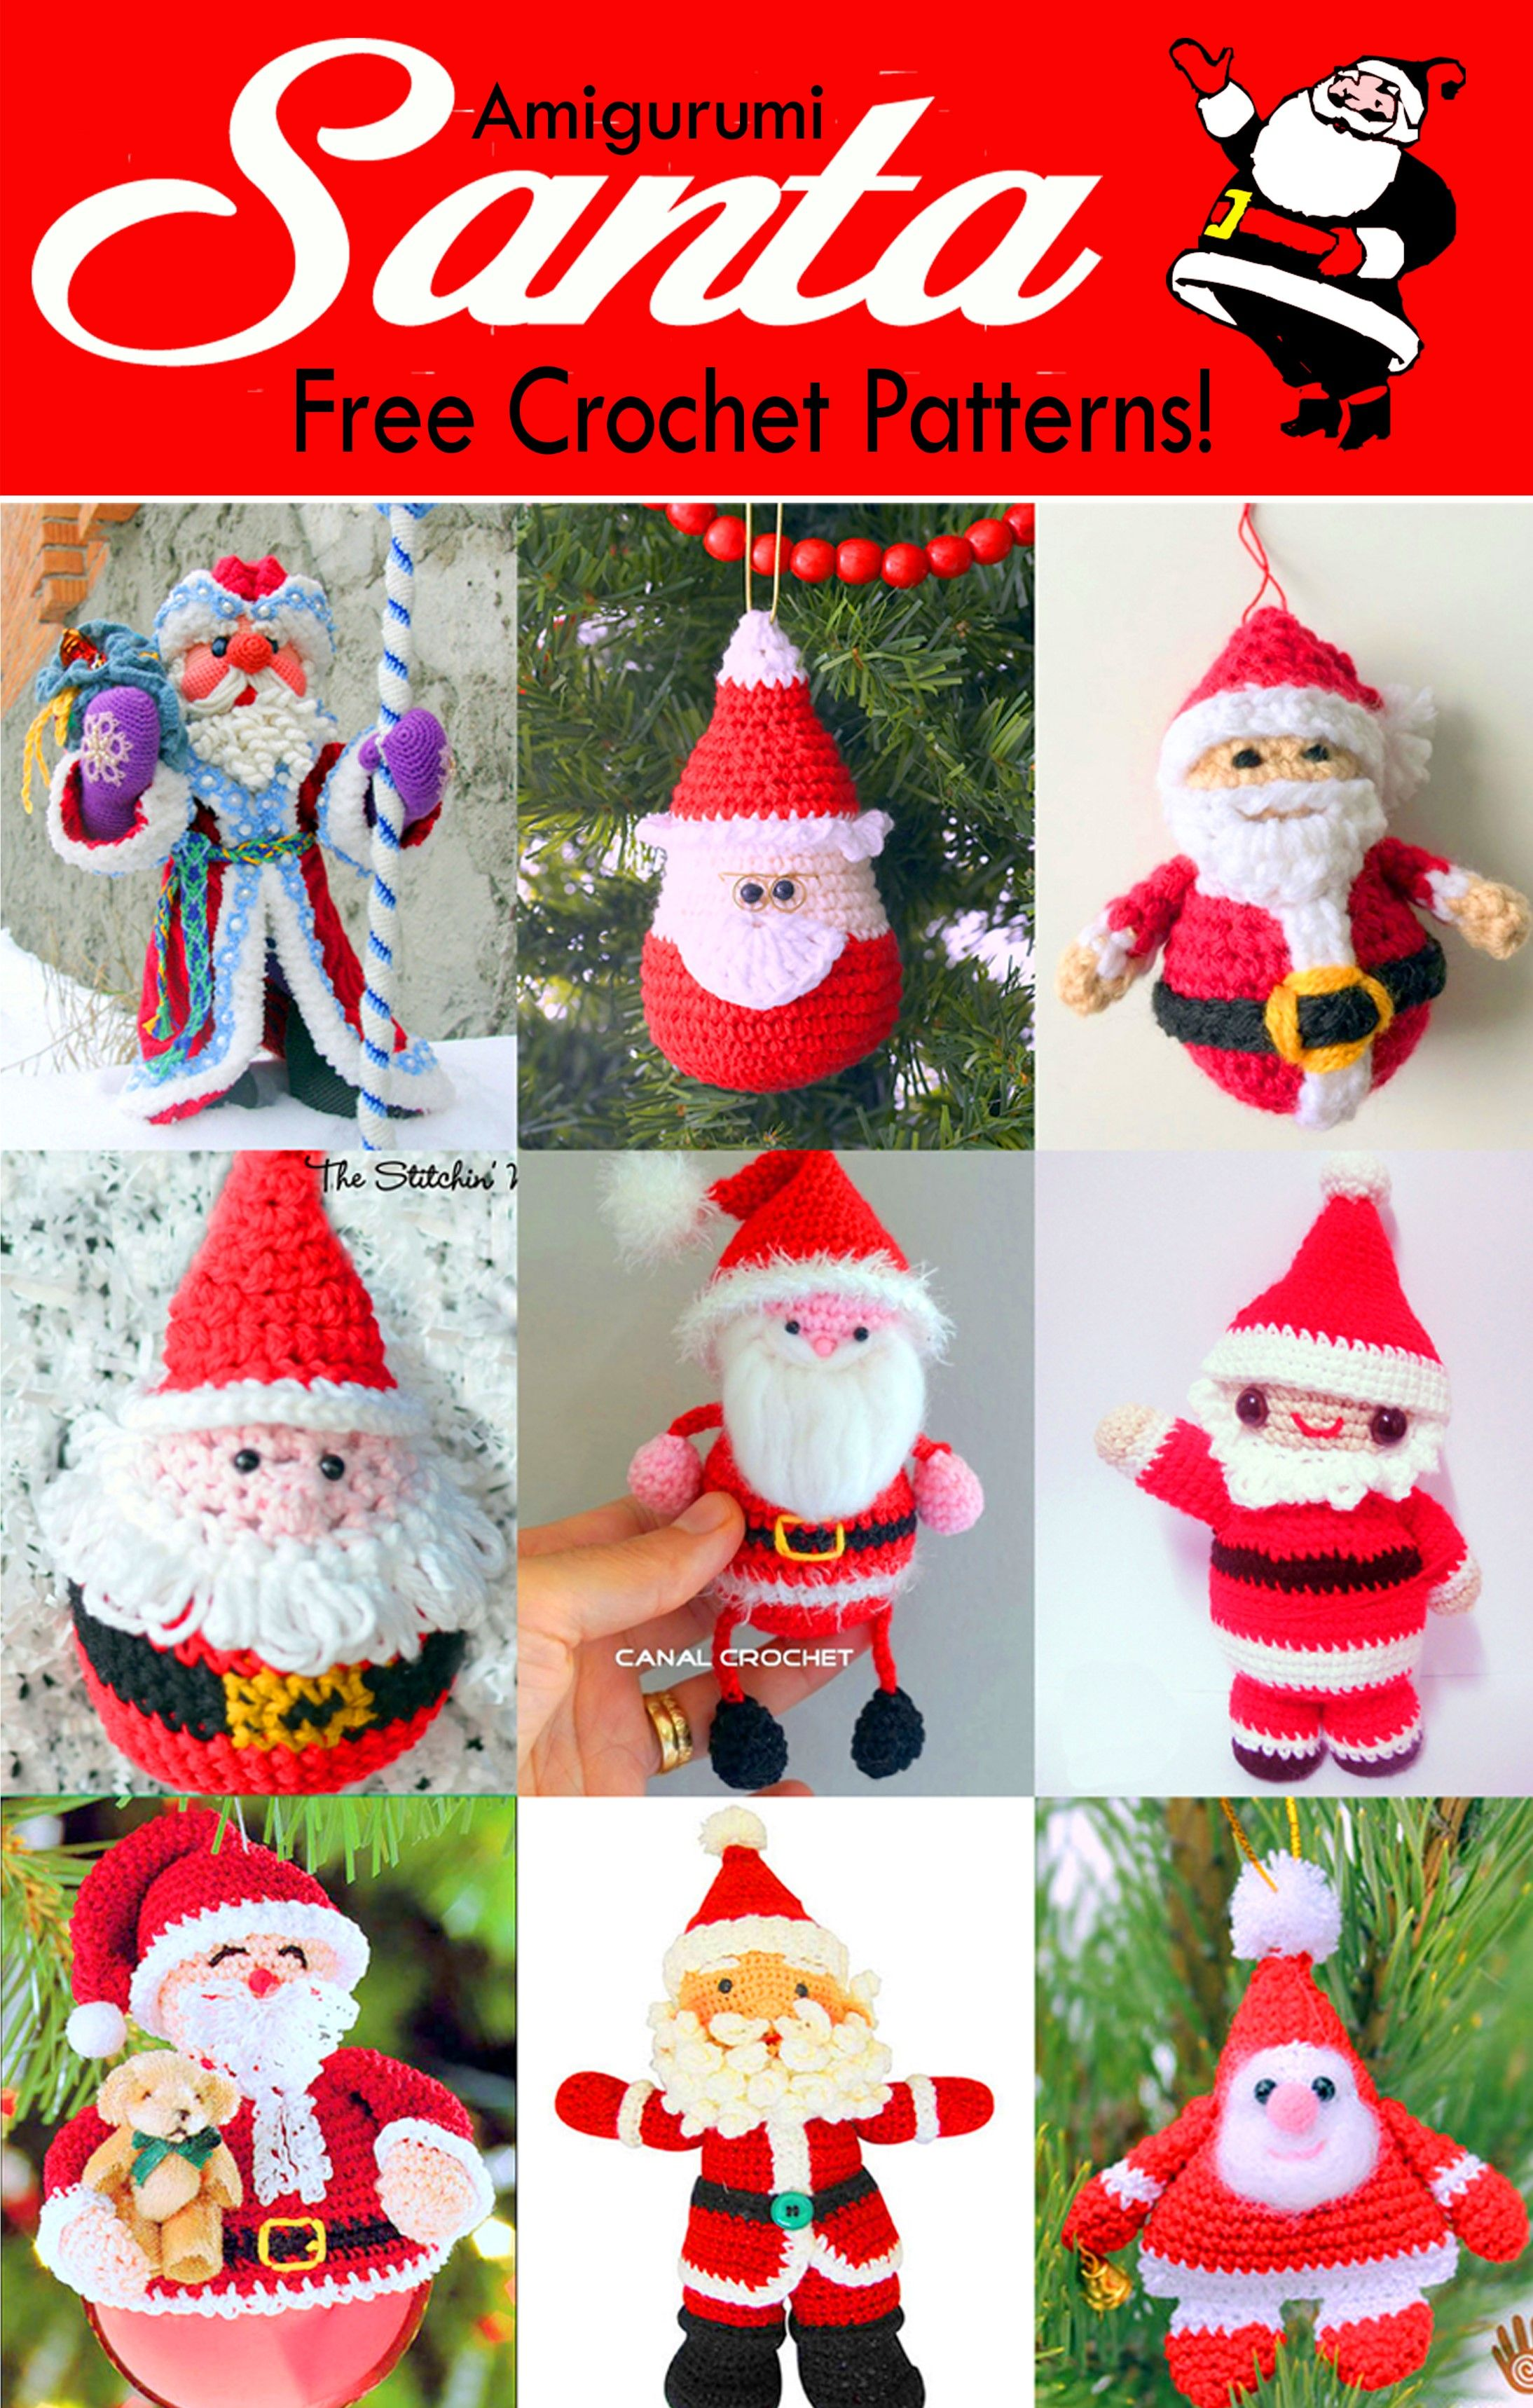 19 Free Amigurumi Christmas Santa Crochet Patterns Crochet Christmas Decorations Christmas Crochet Christmas Crochet Patterns